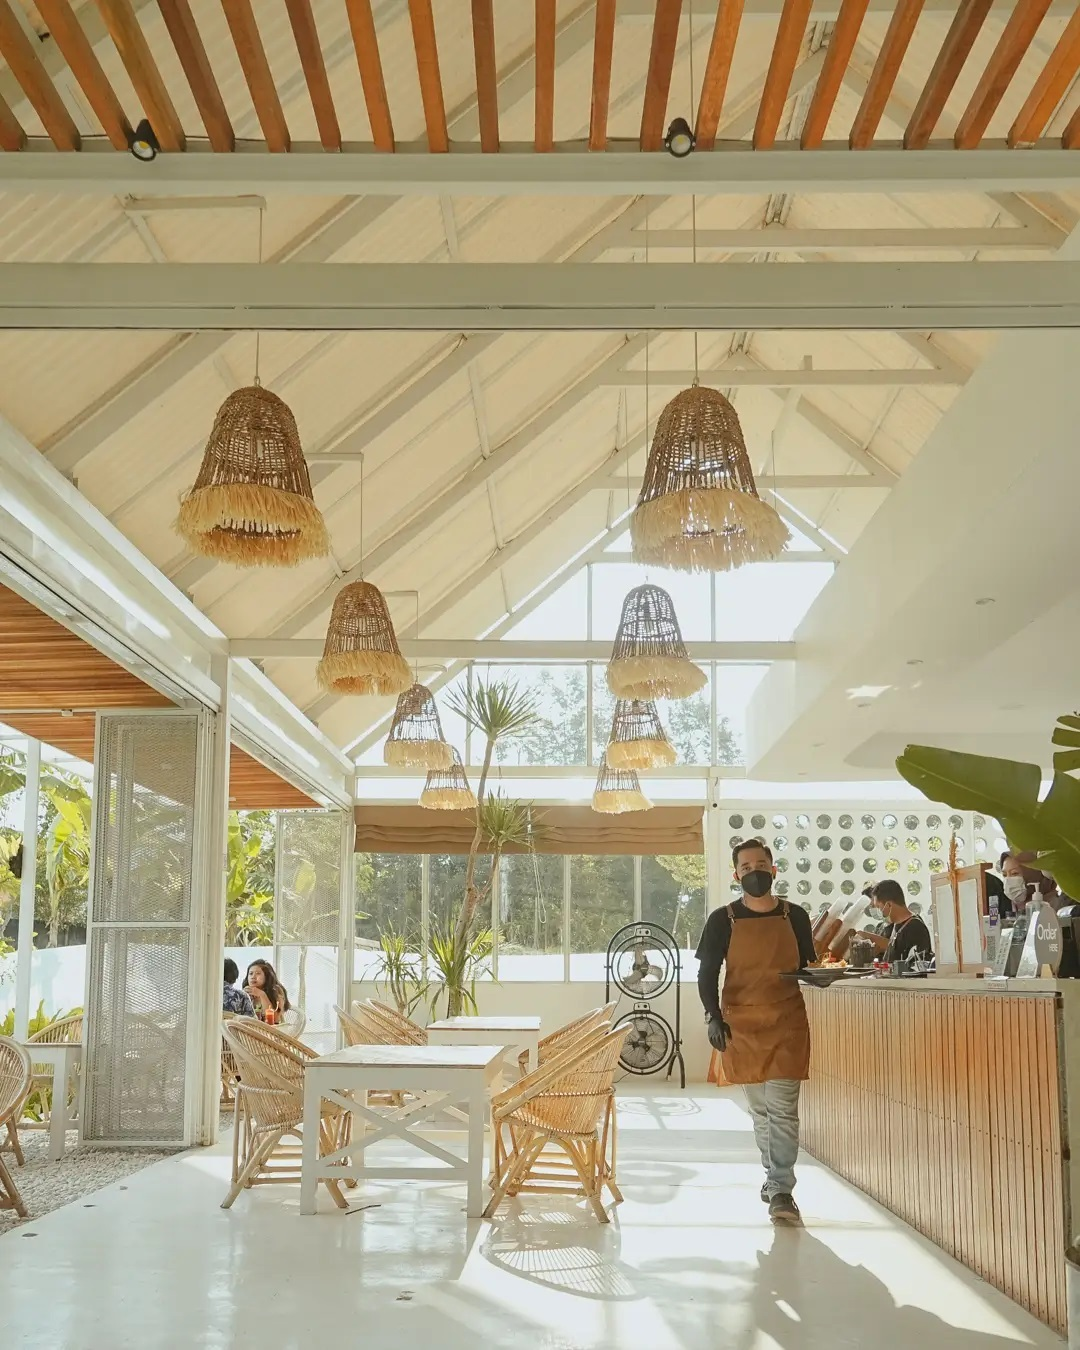 Bagian Indoor Padiku Eatery Coffee Jogja Image From @bayuwisena